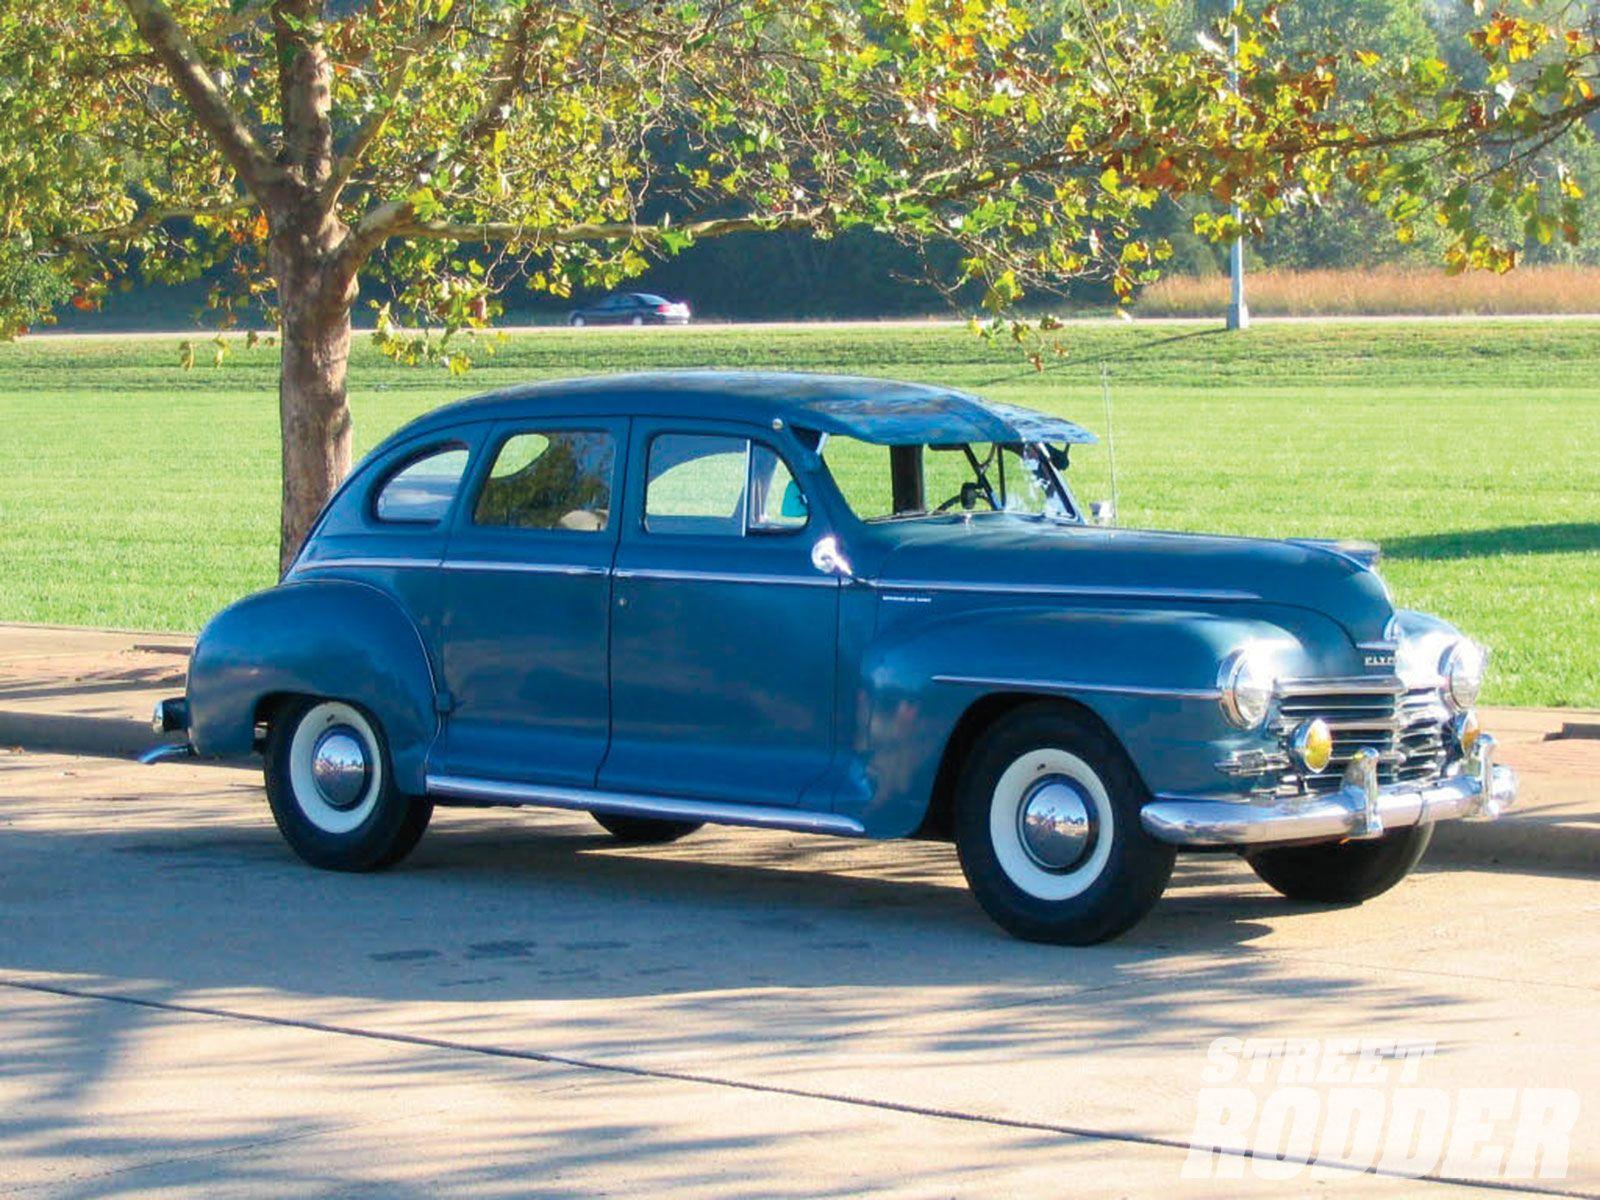 1947 Plymouth Special Deluxe 4 Door Sedan Dengan Gambar